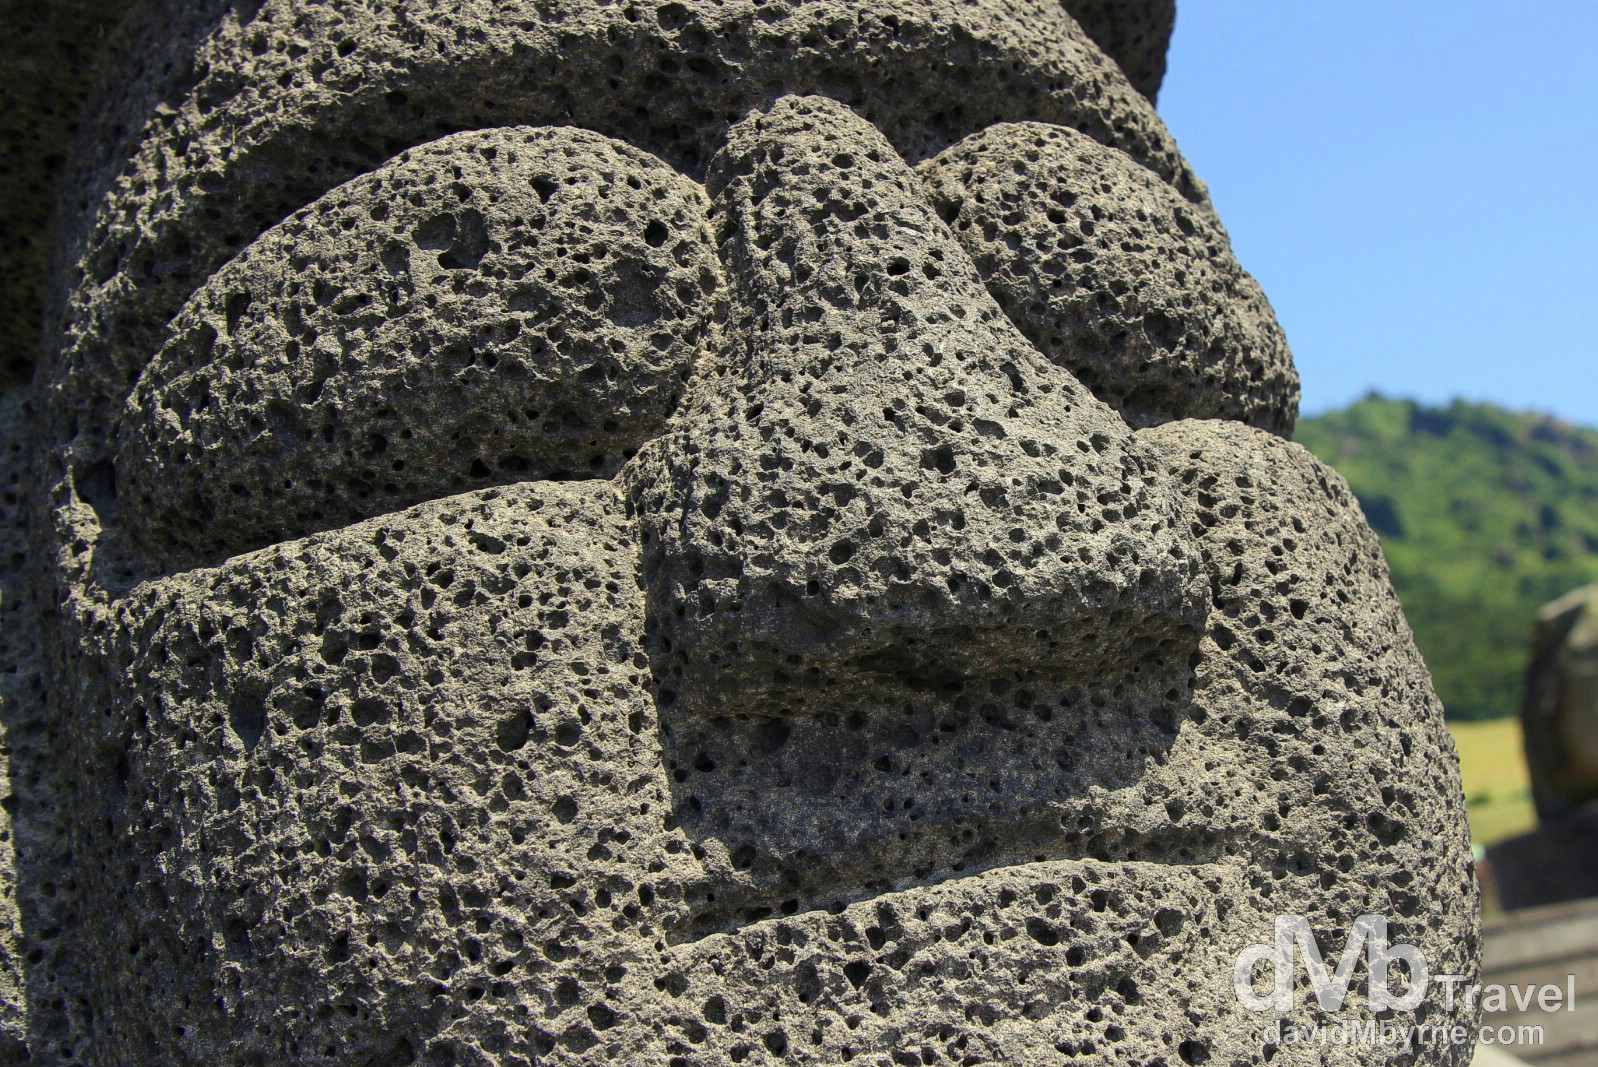 The face of Jeju Island's symbolic Dol Hareubang, aka the 'Grandfather Statues'. Jeju-do, South Korea. July 16th, 2011